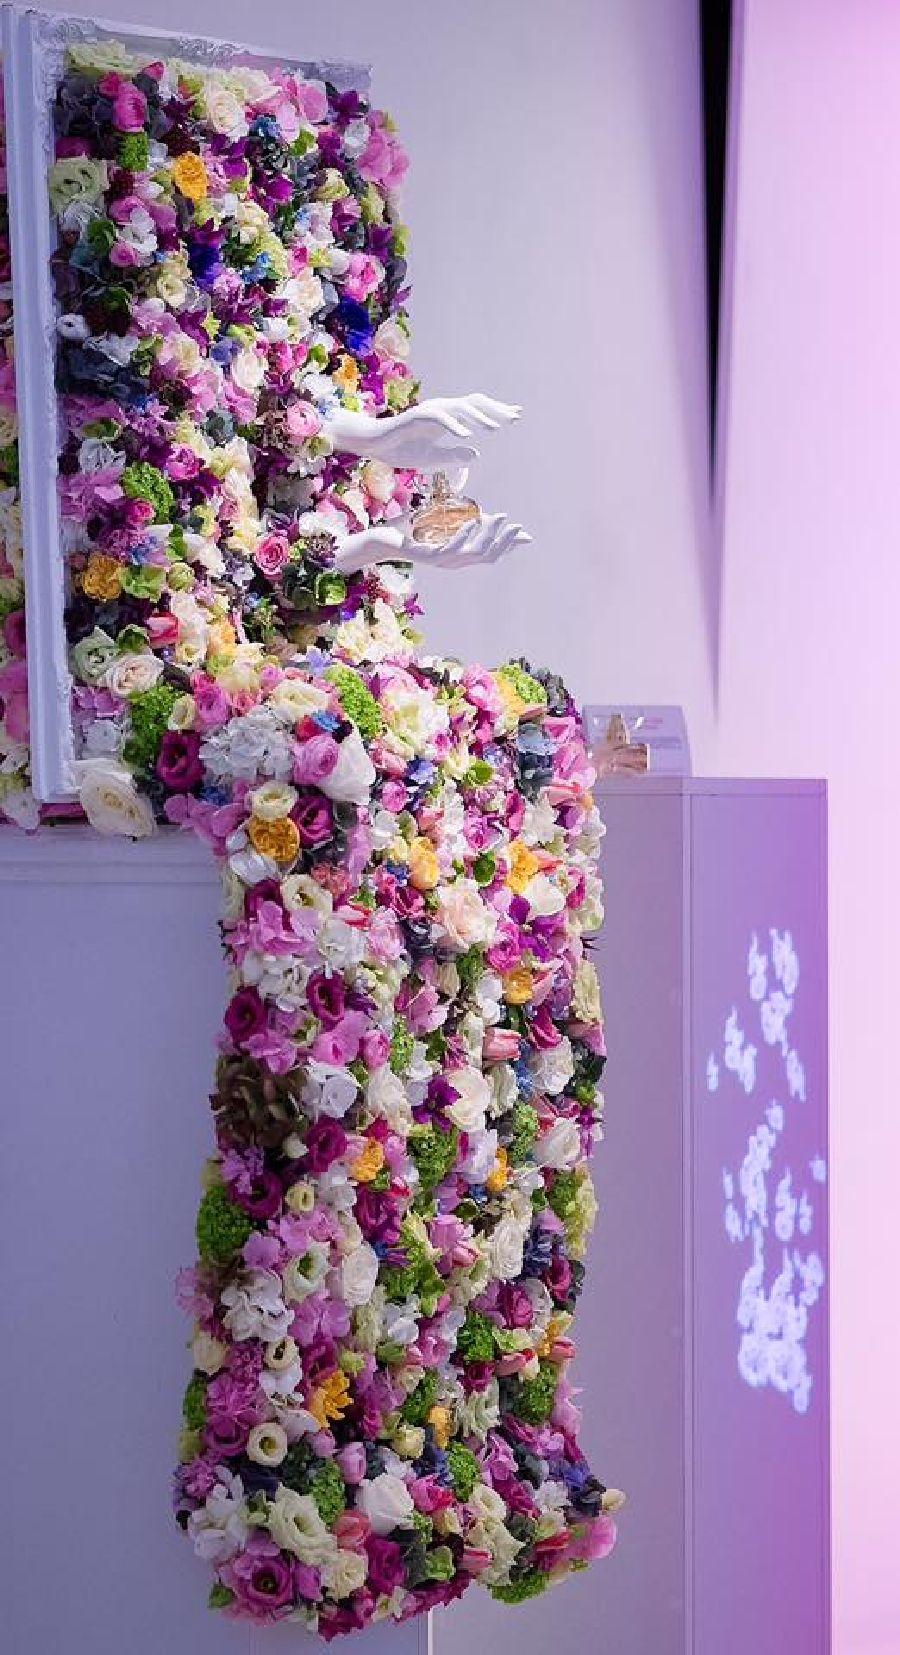 adelaparvu.com despre concurs floral Sun Plaza, florist Alex Dadoo, Maison Dadoo (5)